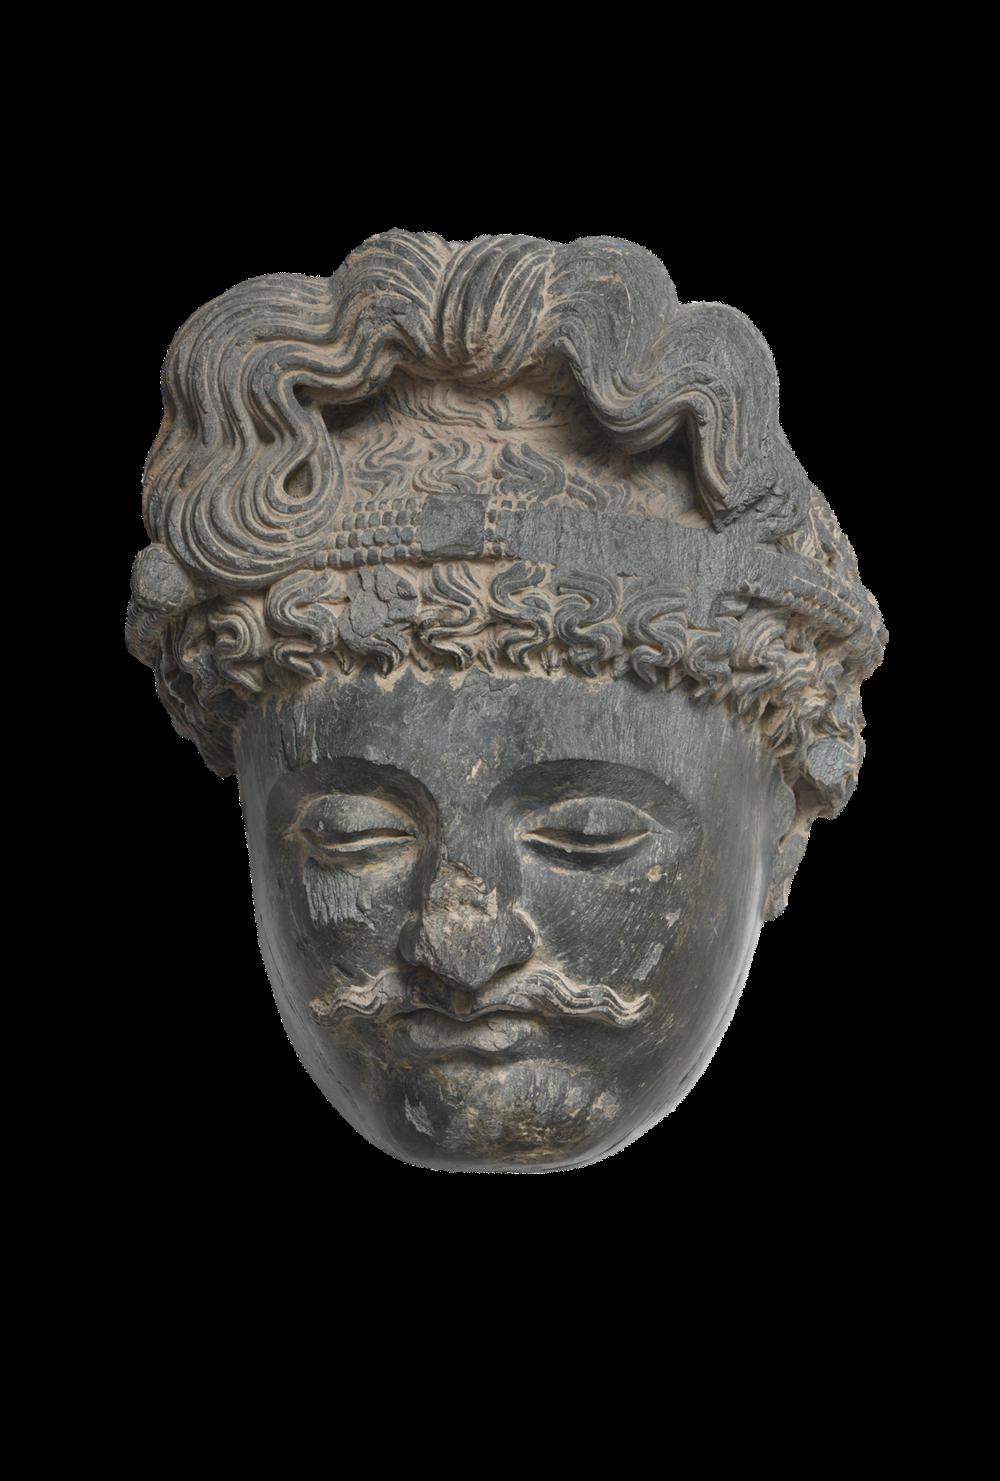 Monumentaler Kopf eines Bodhisattva